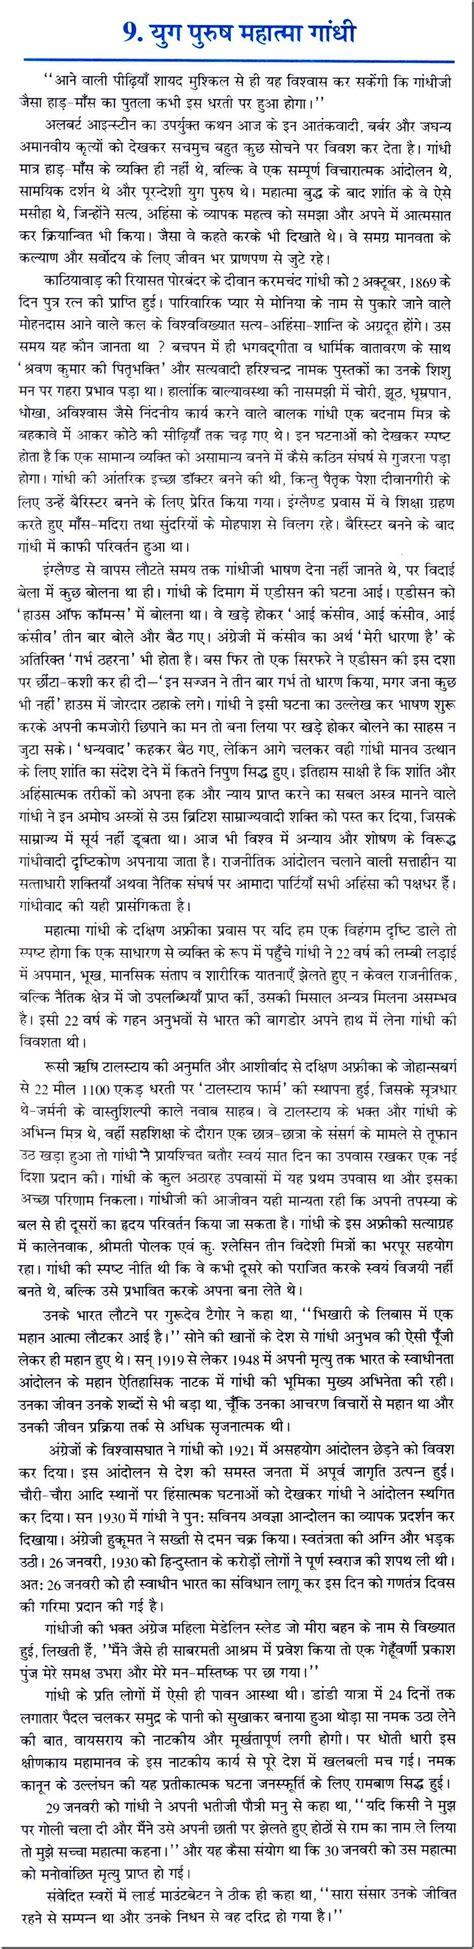 biography of mahatma gandhi resume baal veer outline clipart clipground